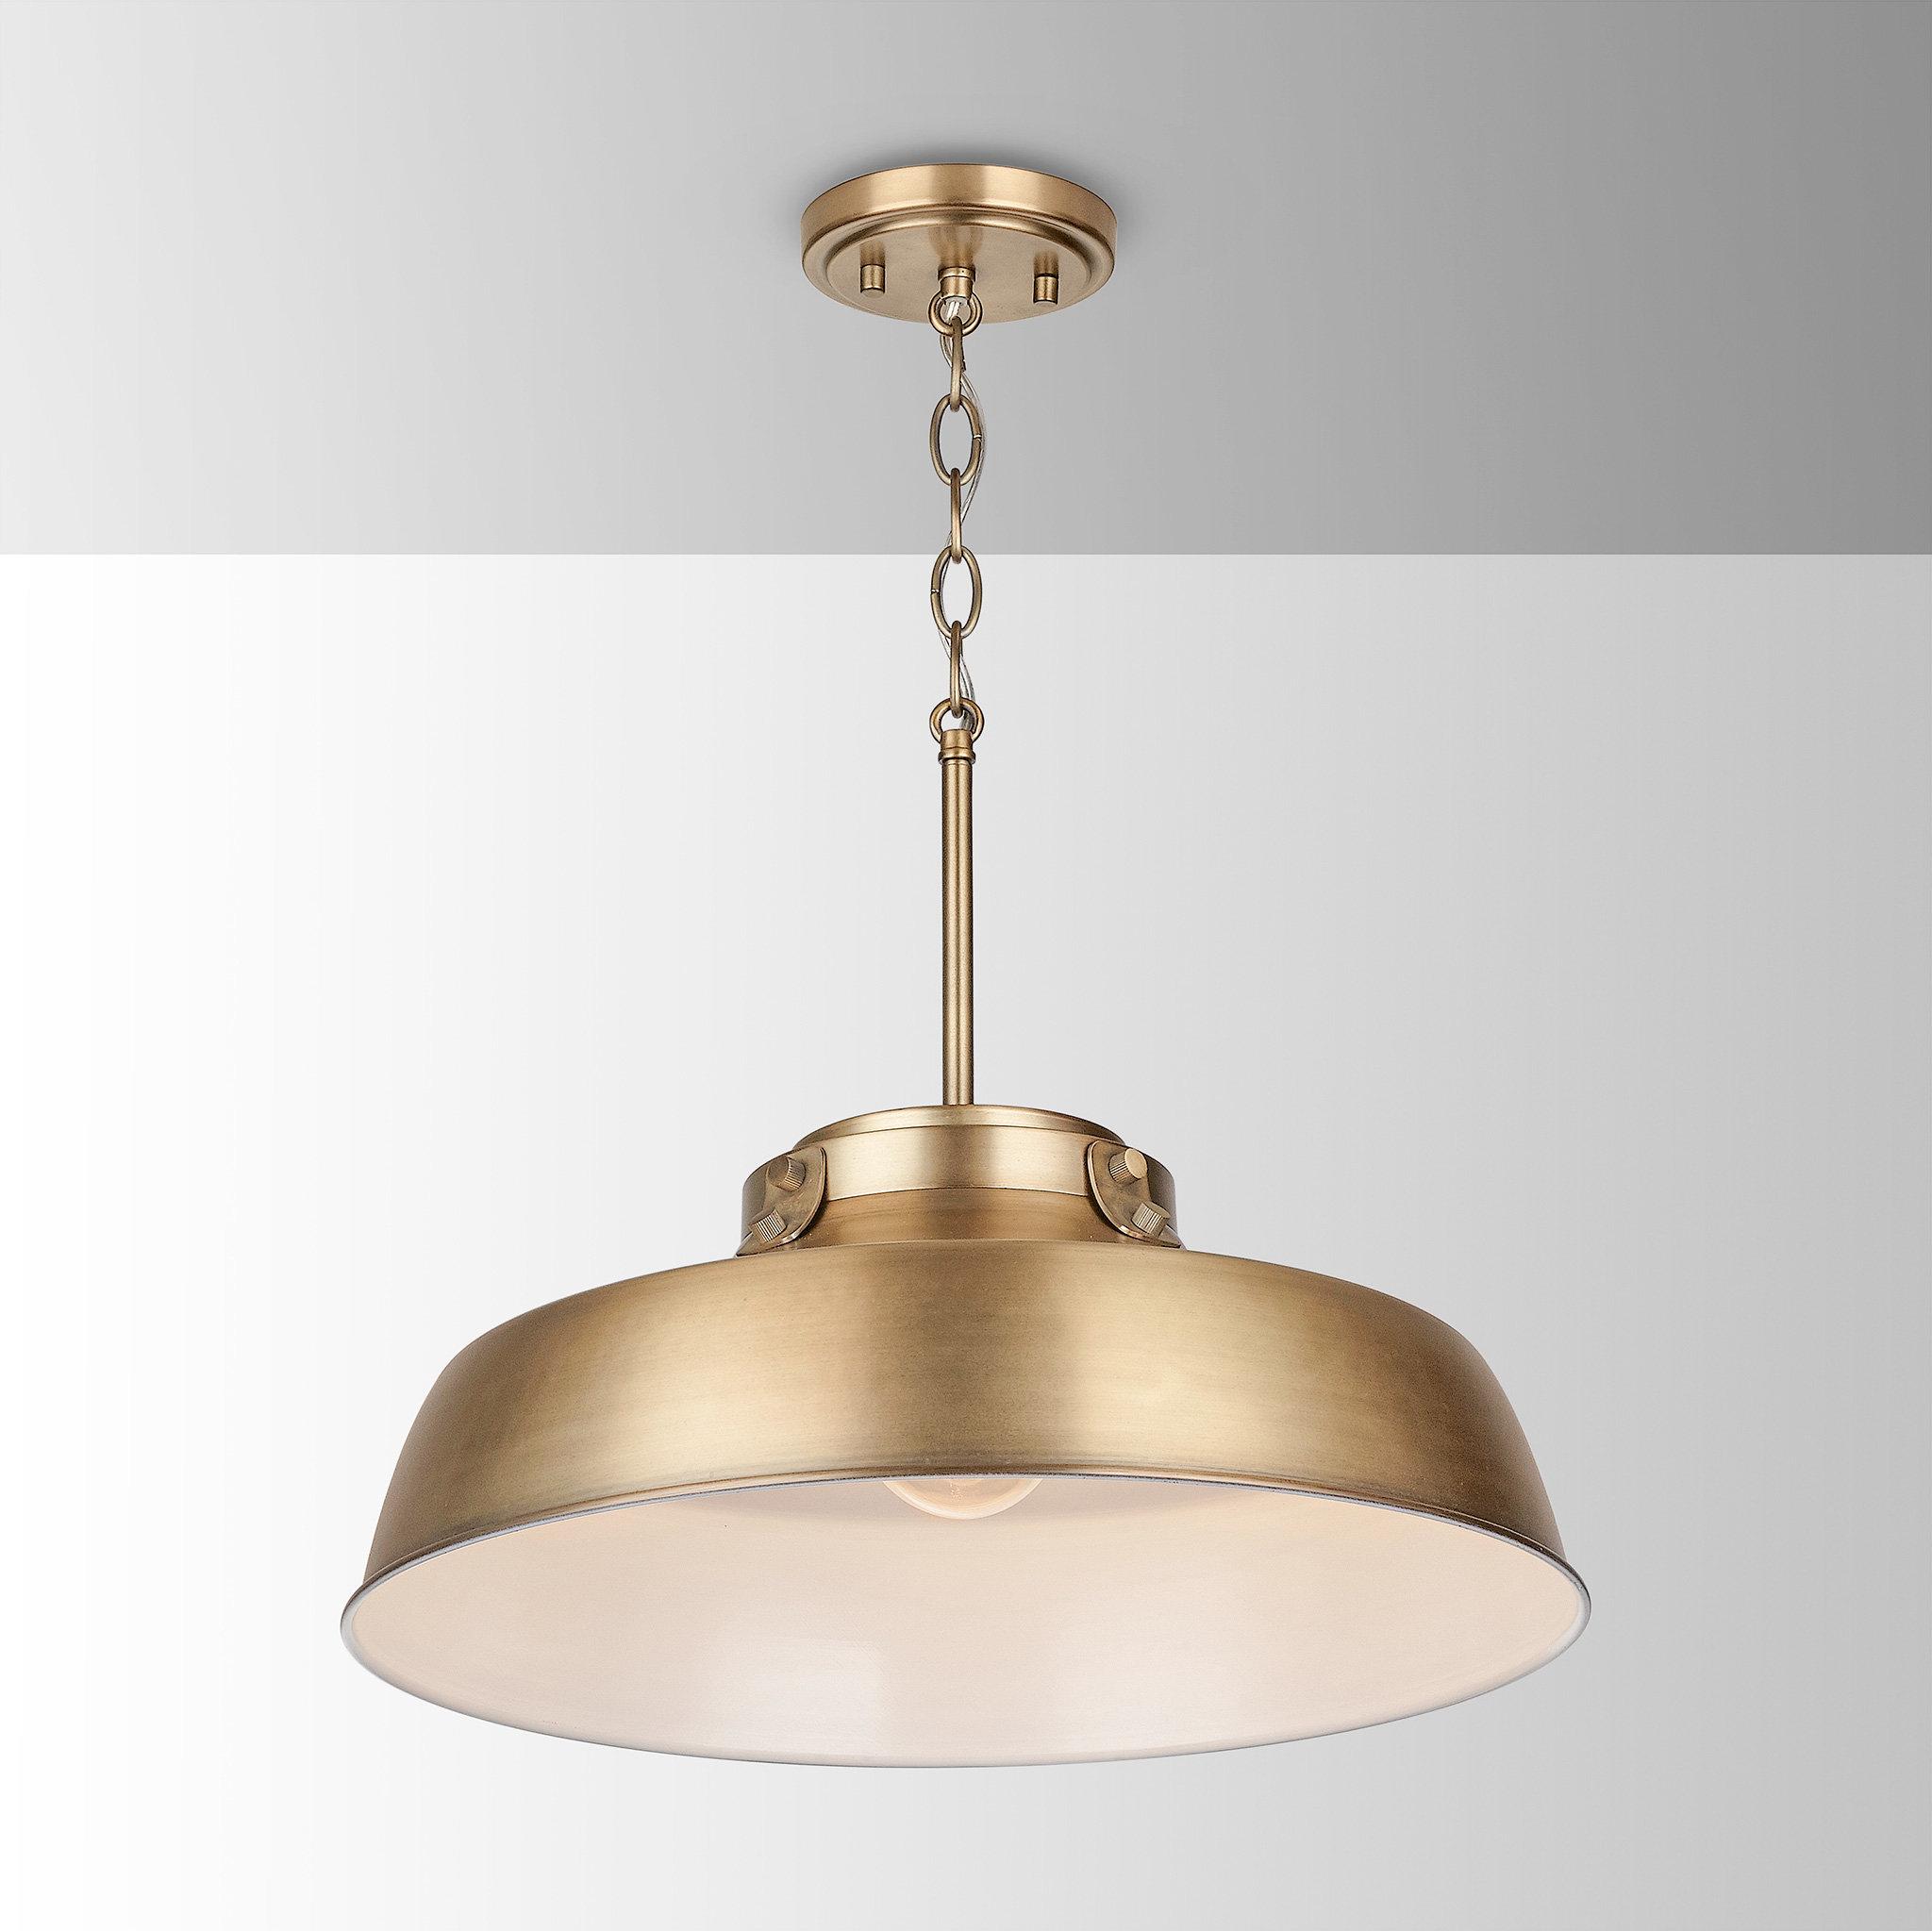 2019 Radtke 3 Light Single Drum Pendants Pertaining To 1 Light Dome Pendant (Gallery 9 of 20)